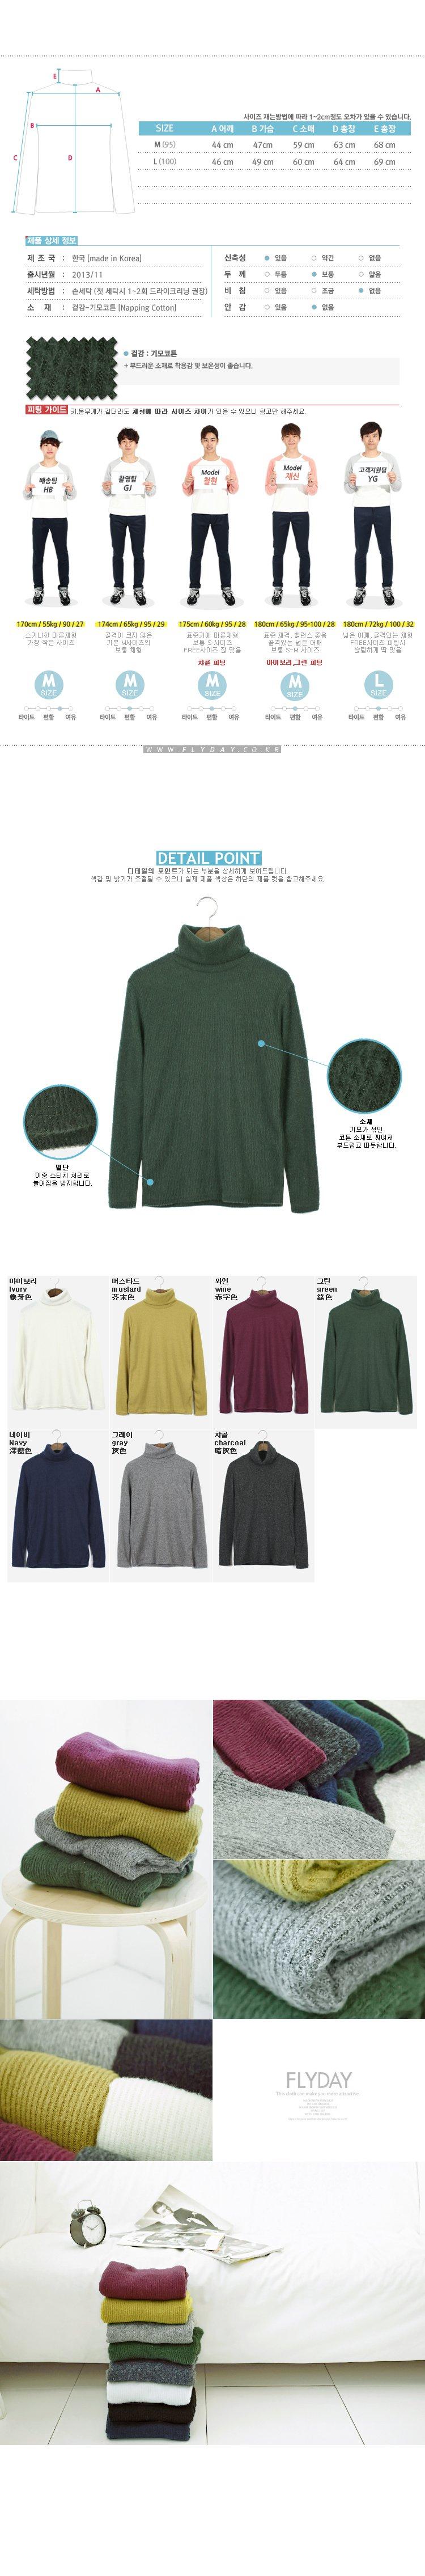 flyday韩国进口男装正品代购新款男士打底高领针织衫131210-10